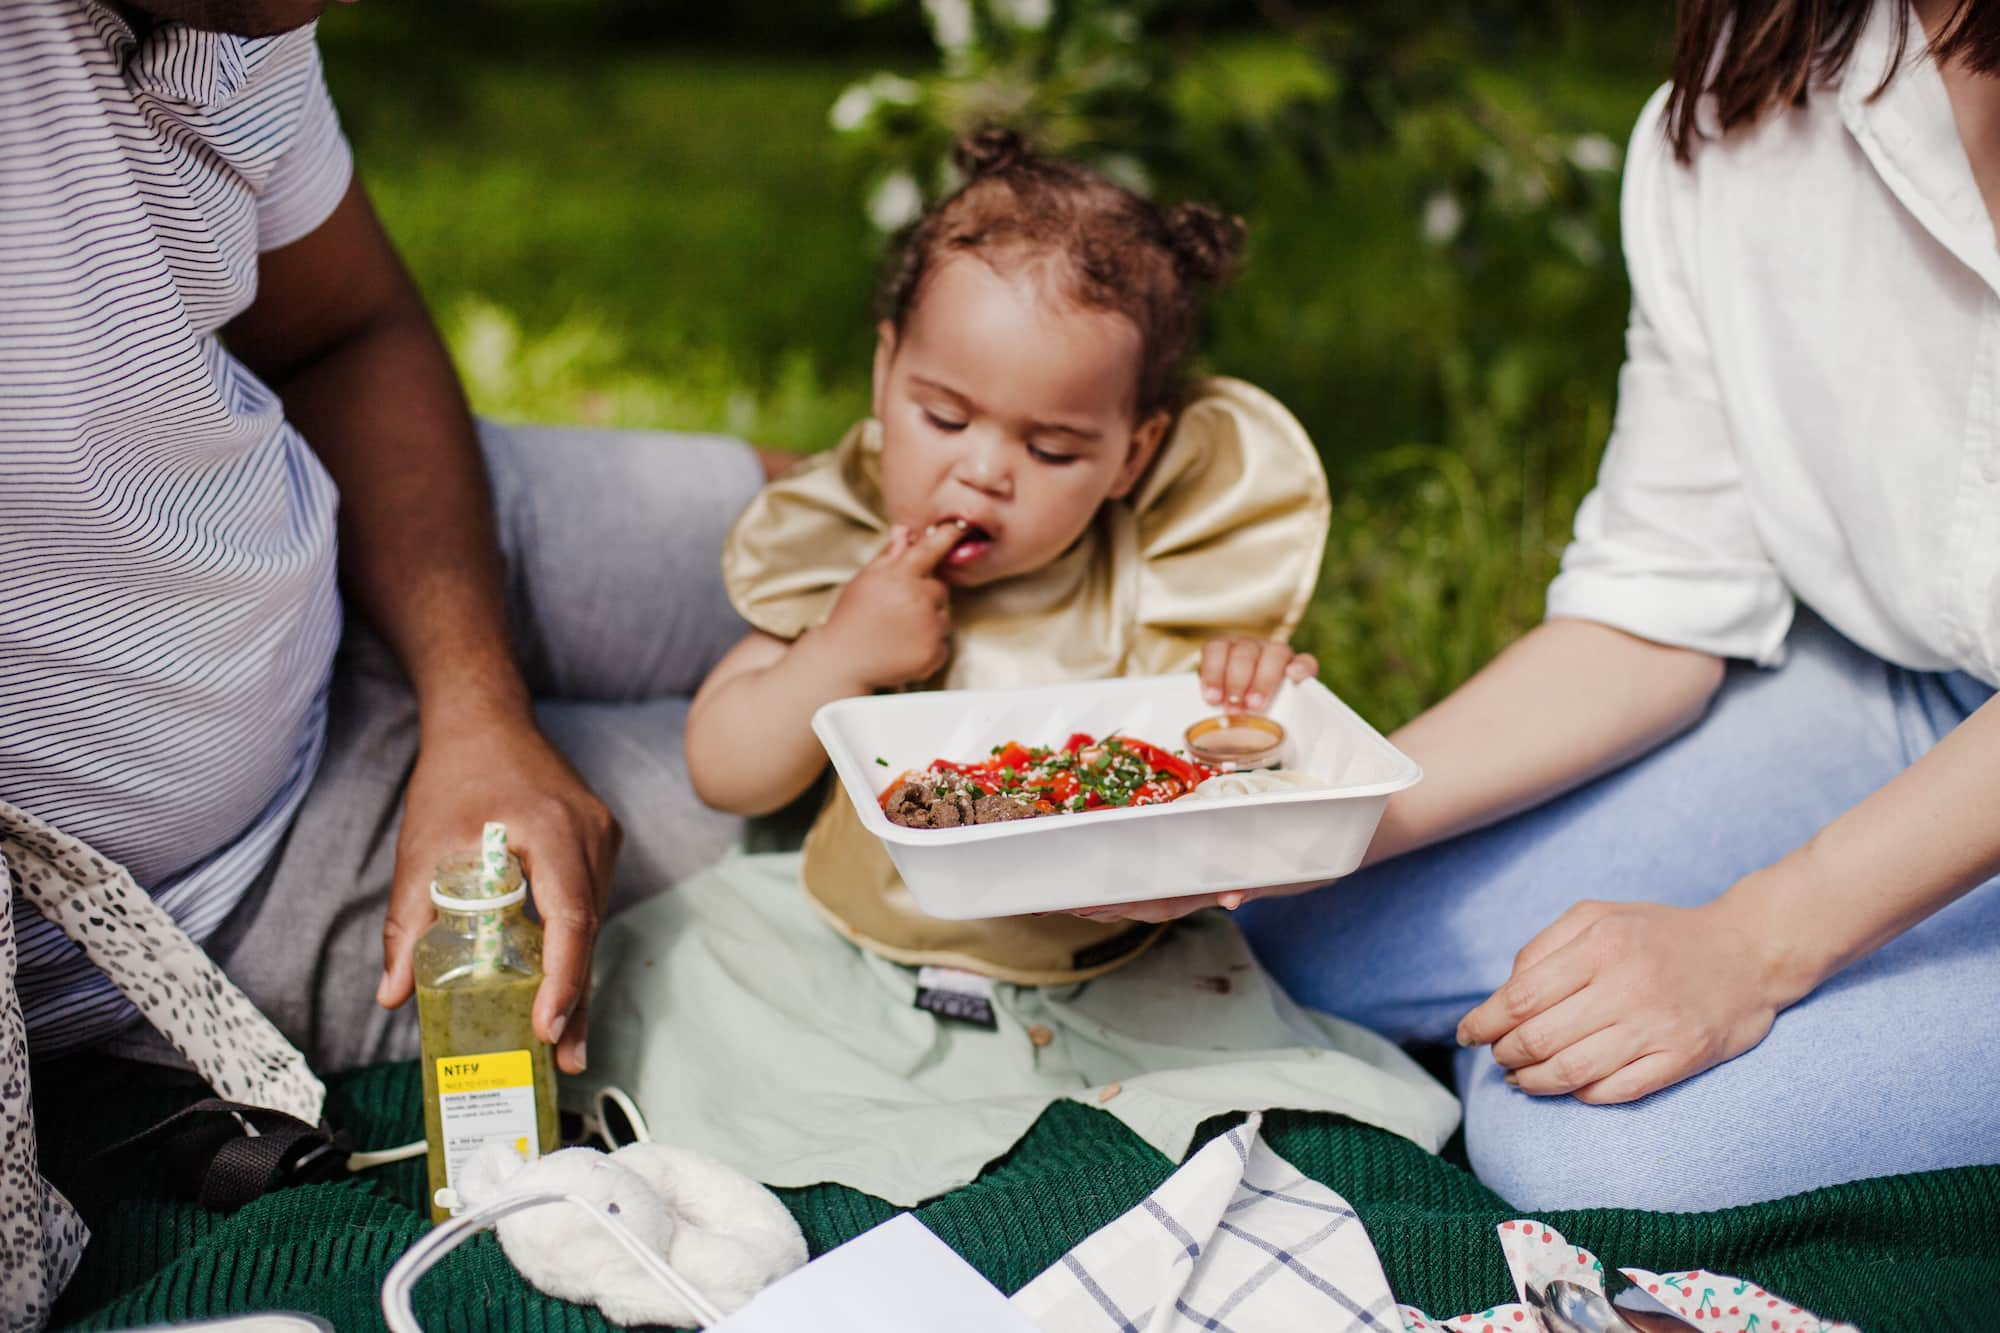 insulinoopornośc u dziecka